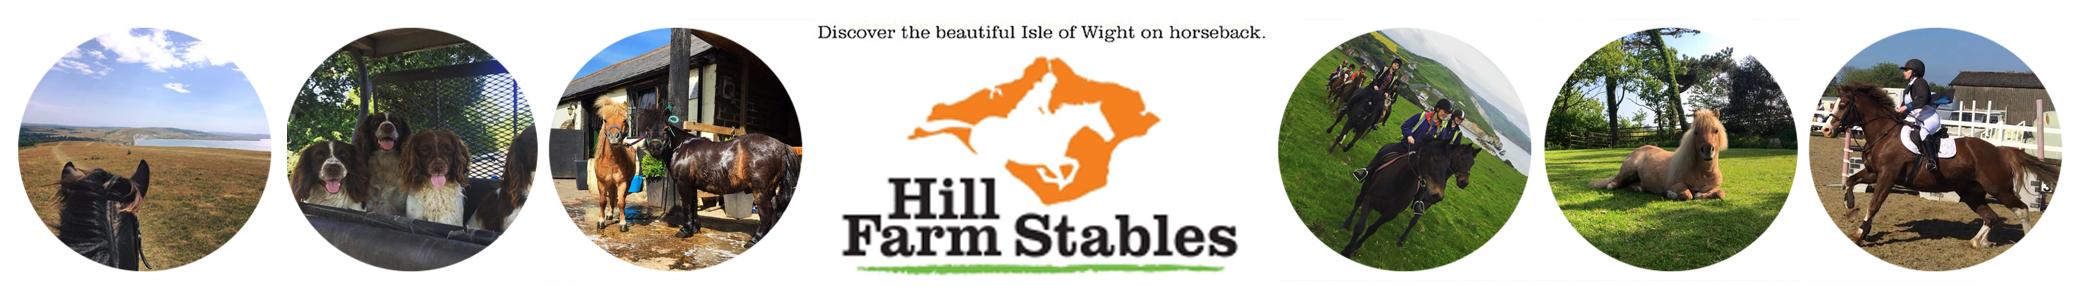 Hill Farm Stables